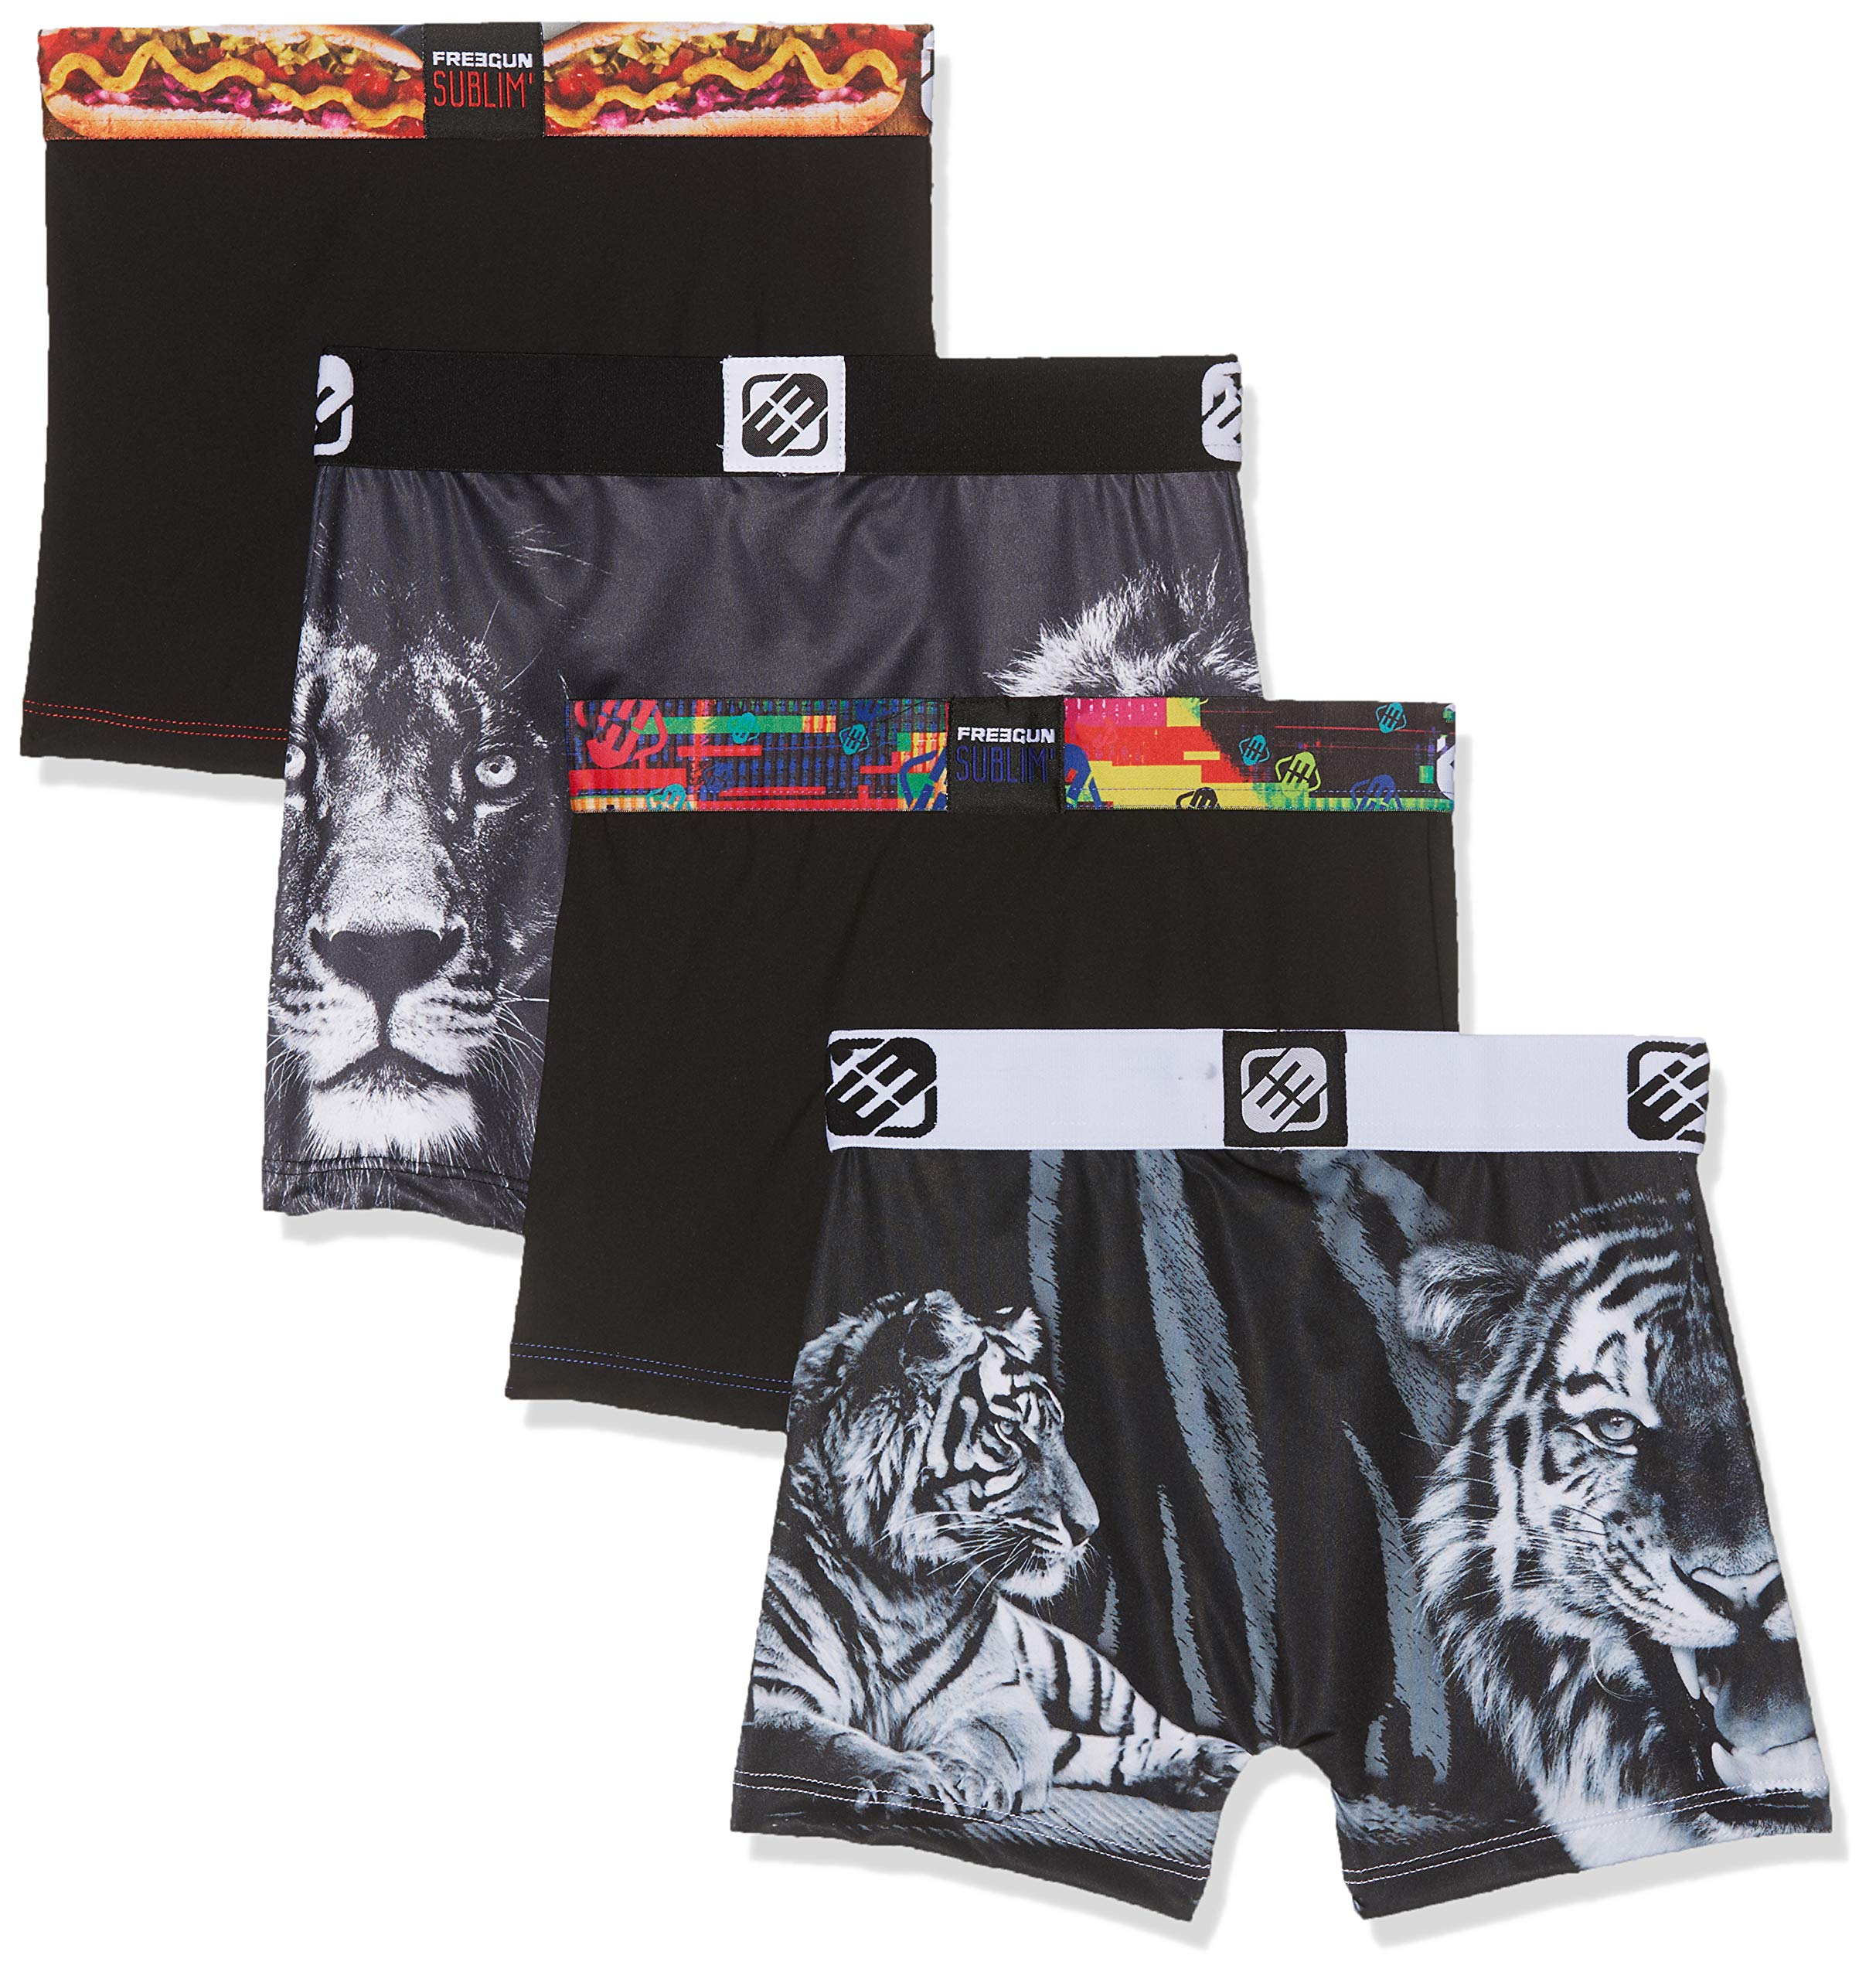 FREEGUN Boxer Pantis (Pack de 4) para Niños